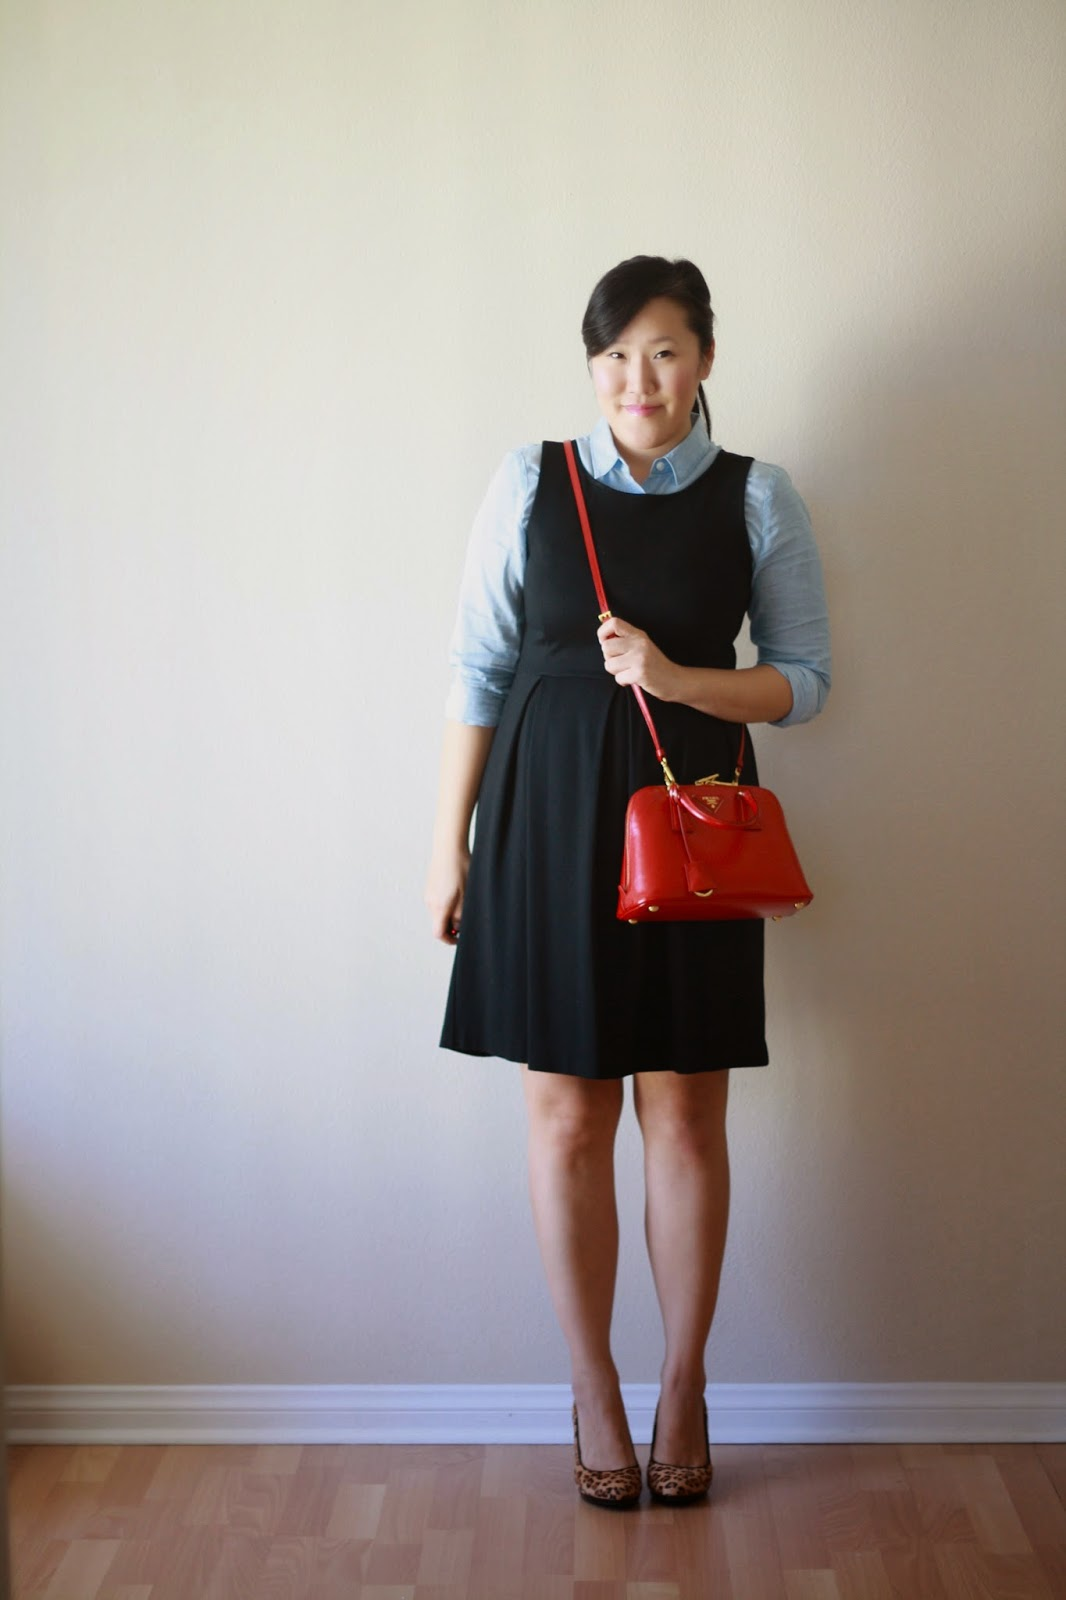 simplyxclassic, loft chambray shirt, celine bag, jcrew hat, prada crossbody, ootd, style, fashion blogger